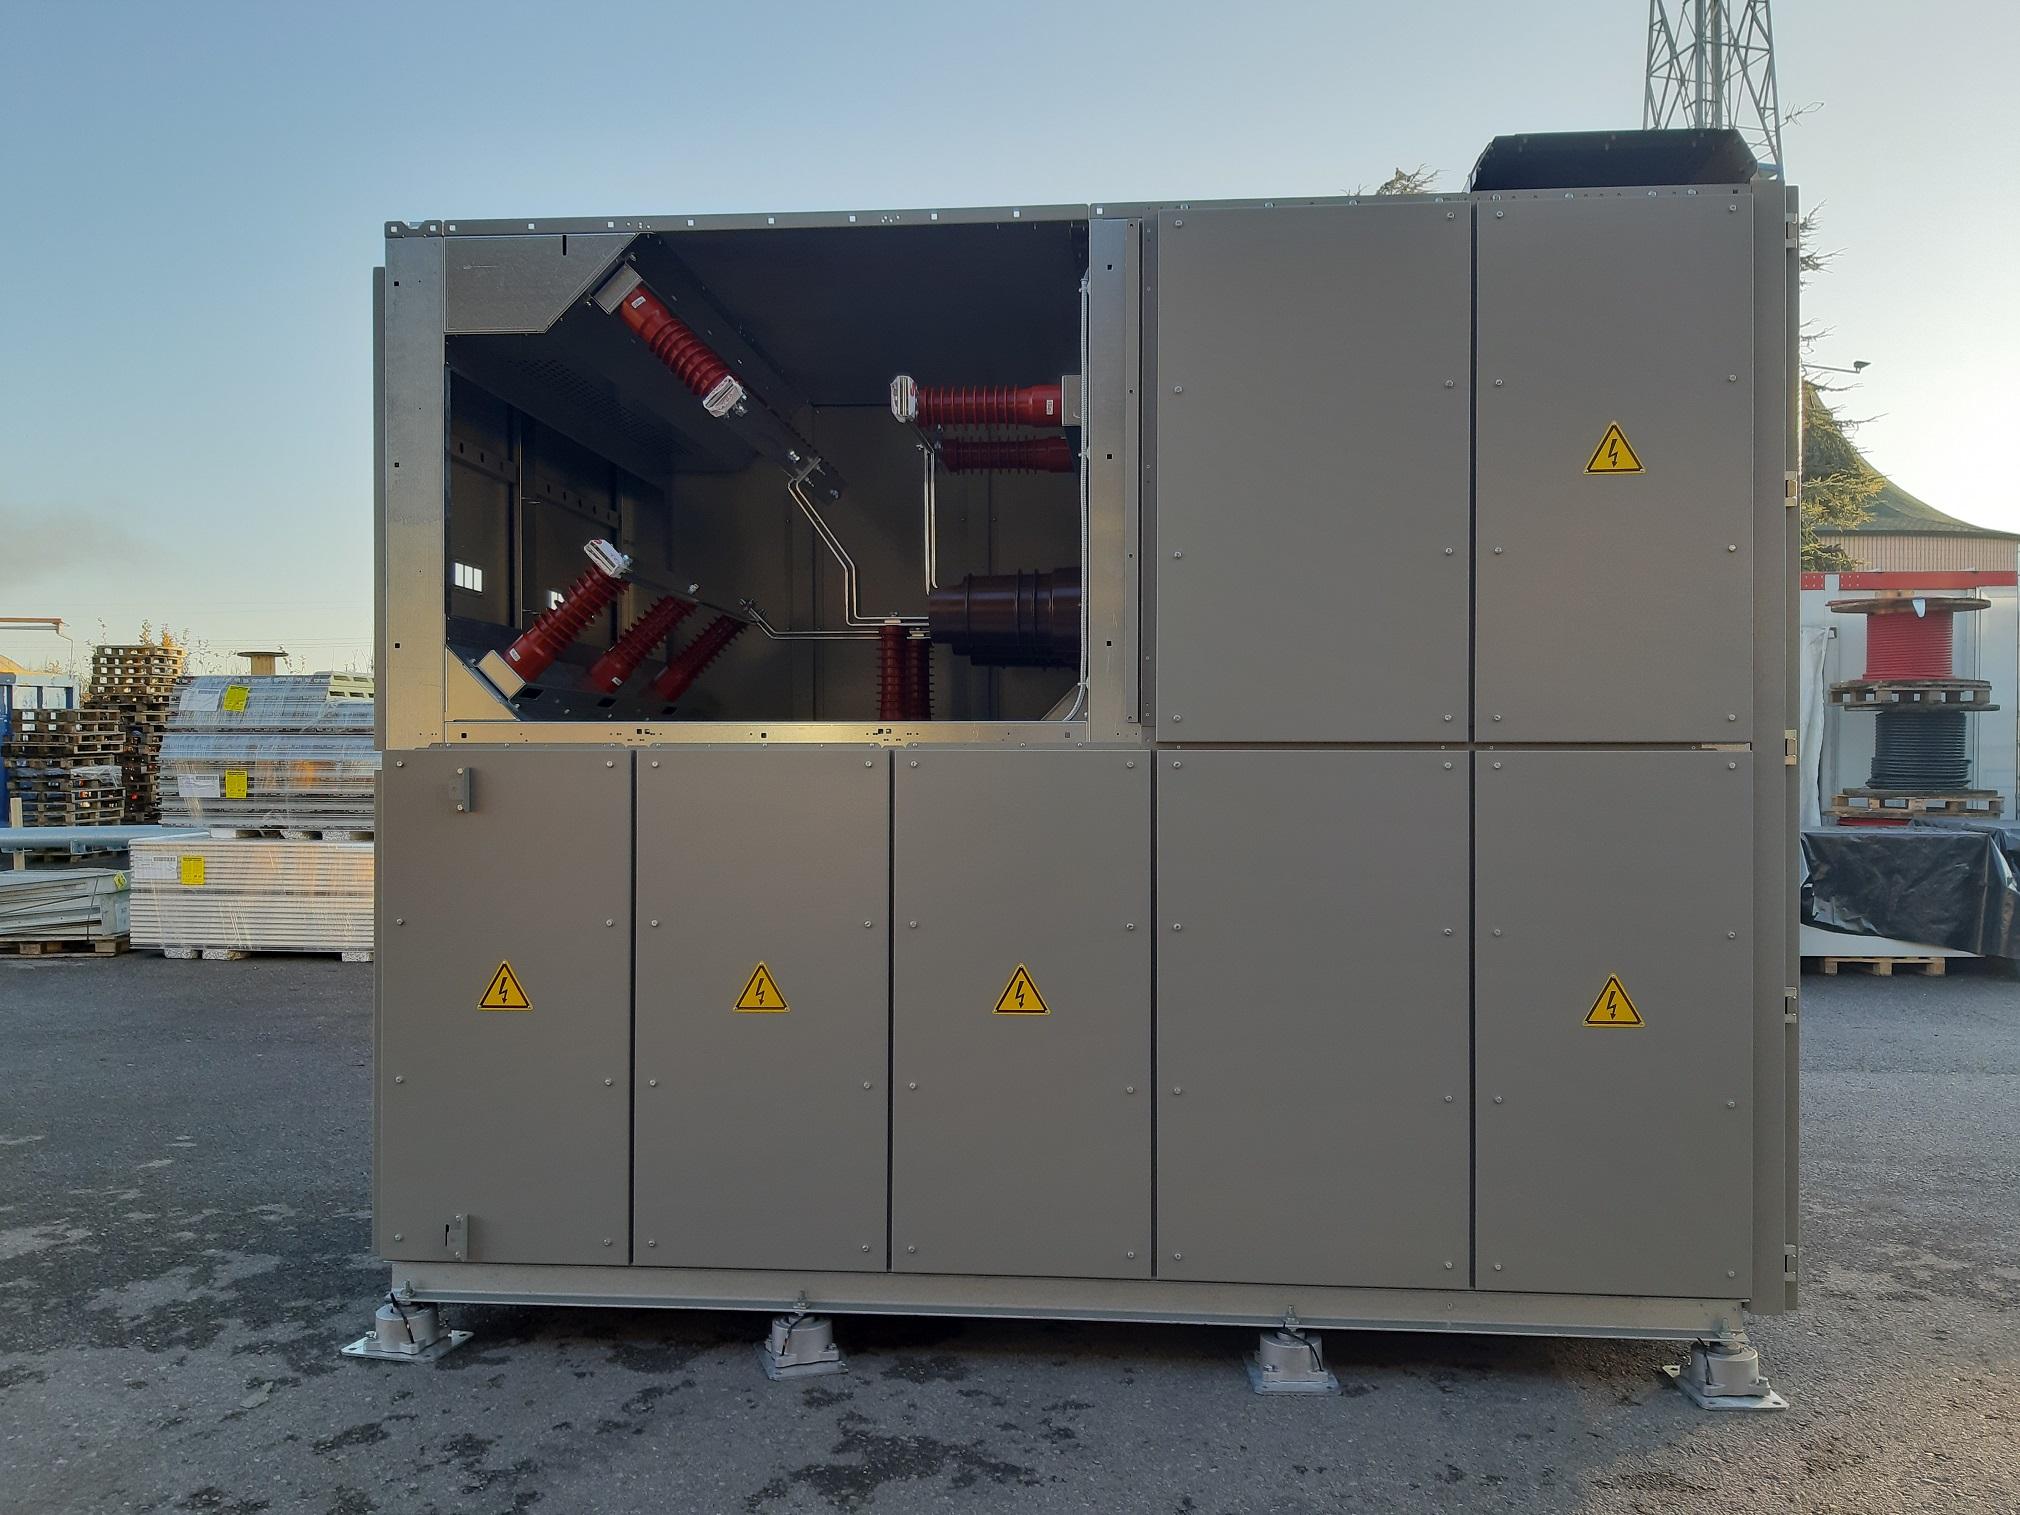 40.5kV electrical switchgear